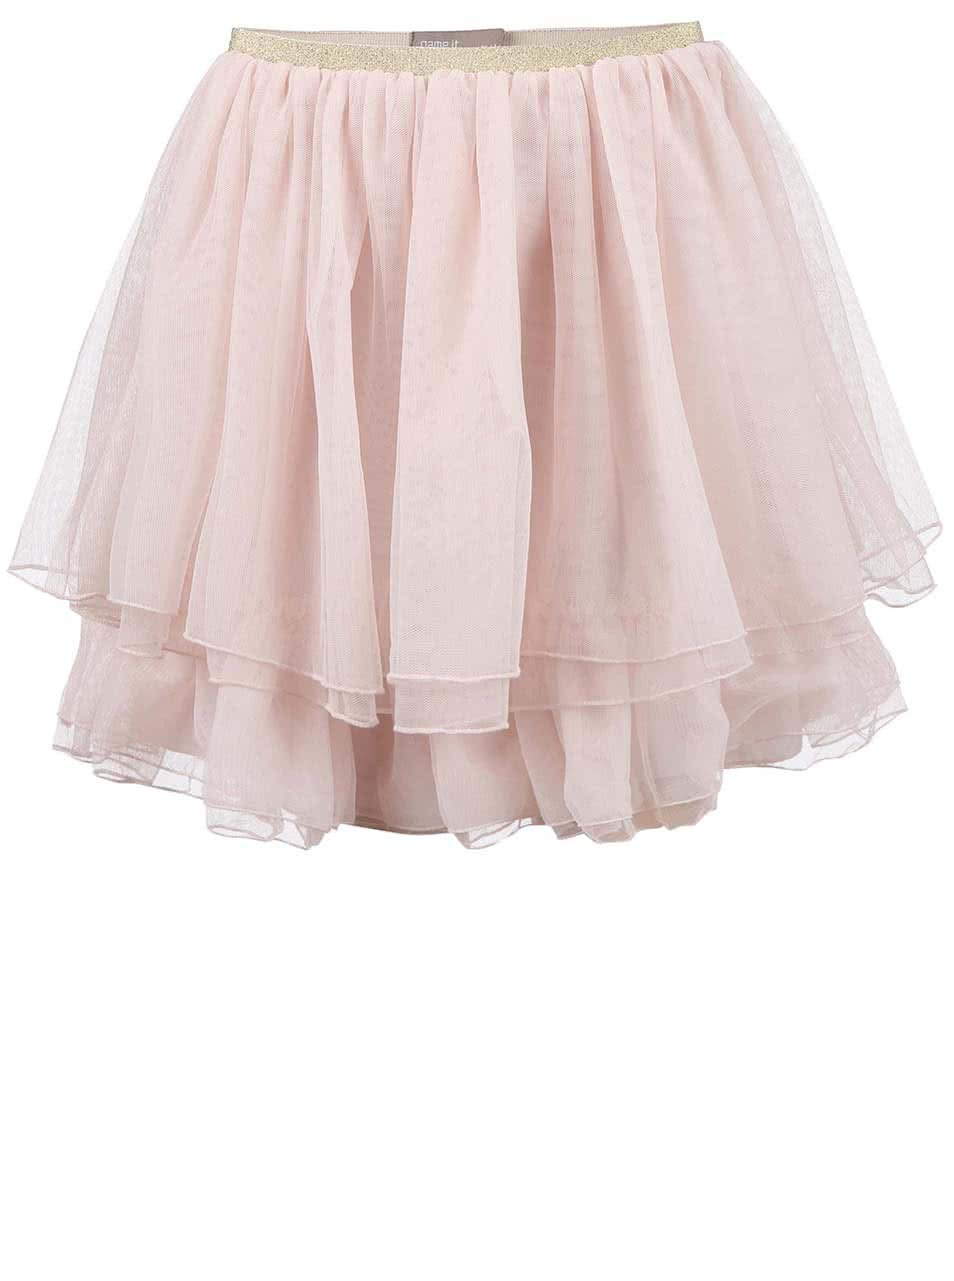 674d8e7457 Ružová dievčenská sukňa name it Hanja ...